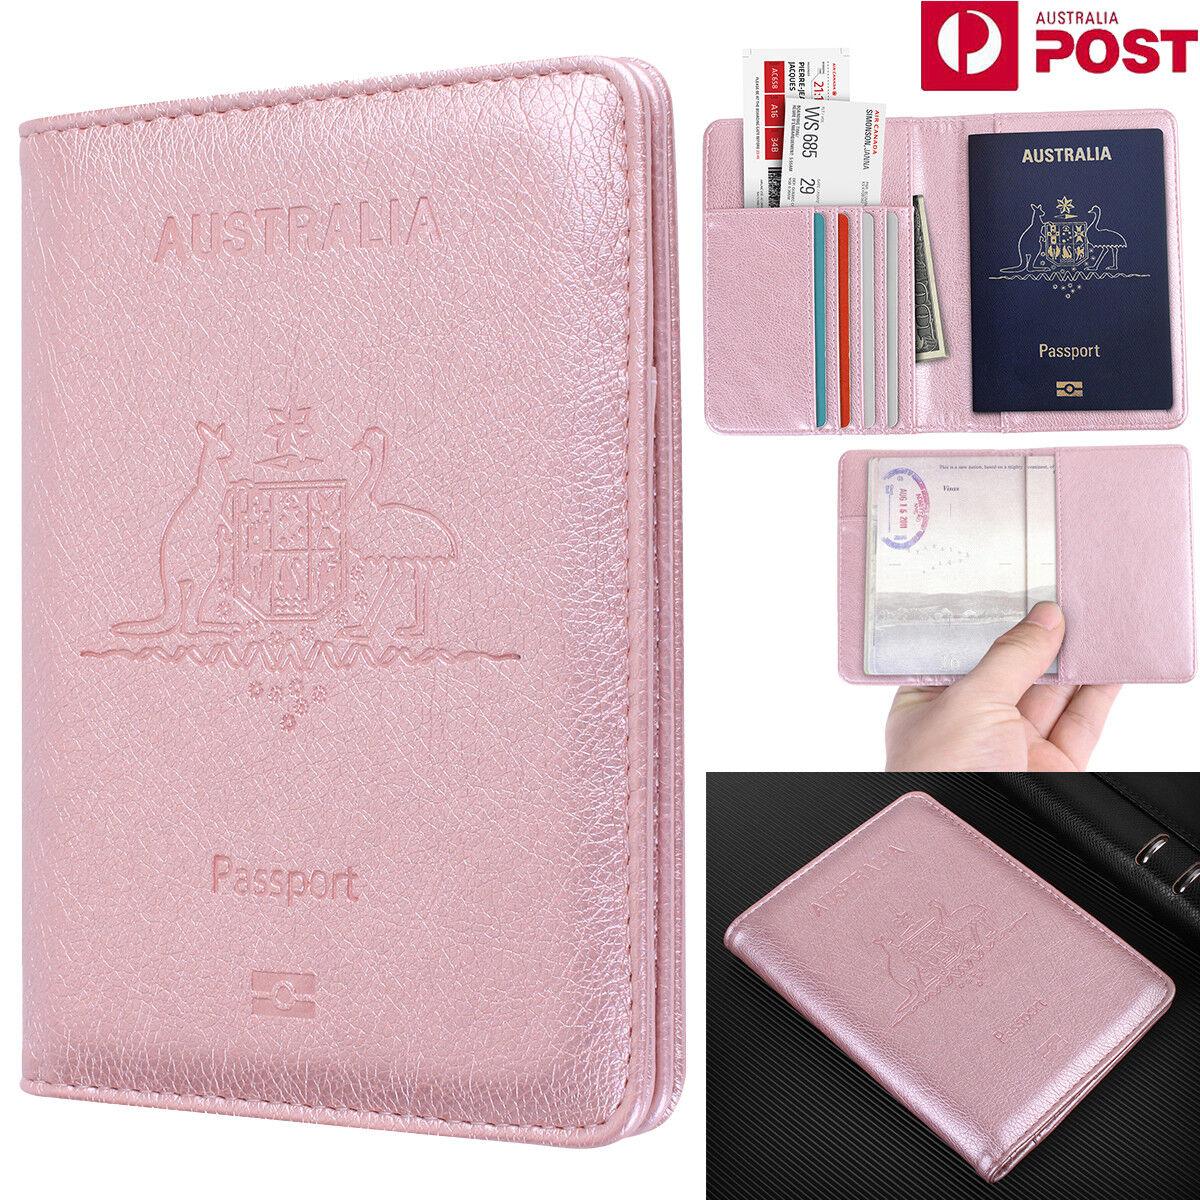 Slim Leather Travel Passport Wallet Holder RFID Blocking ID Card Case Cover AU 5